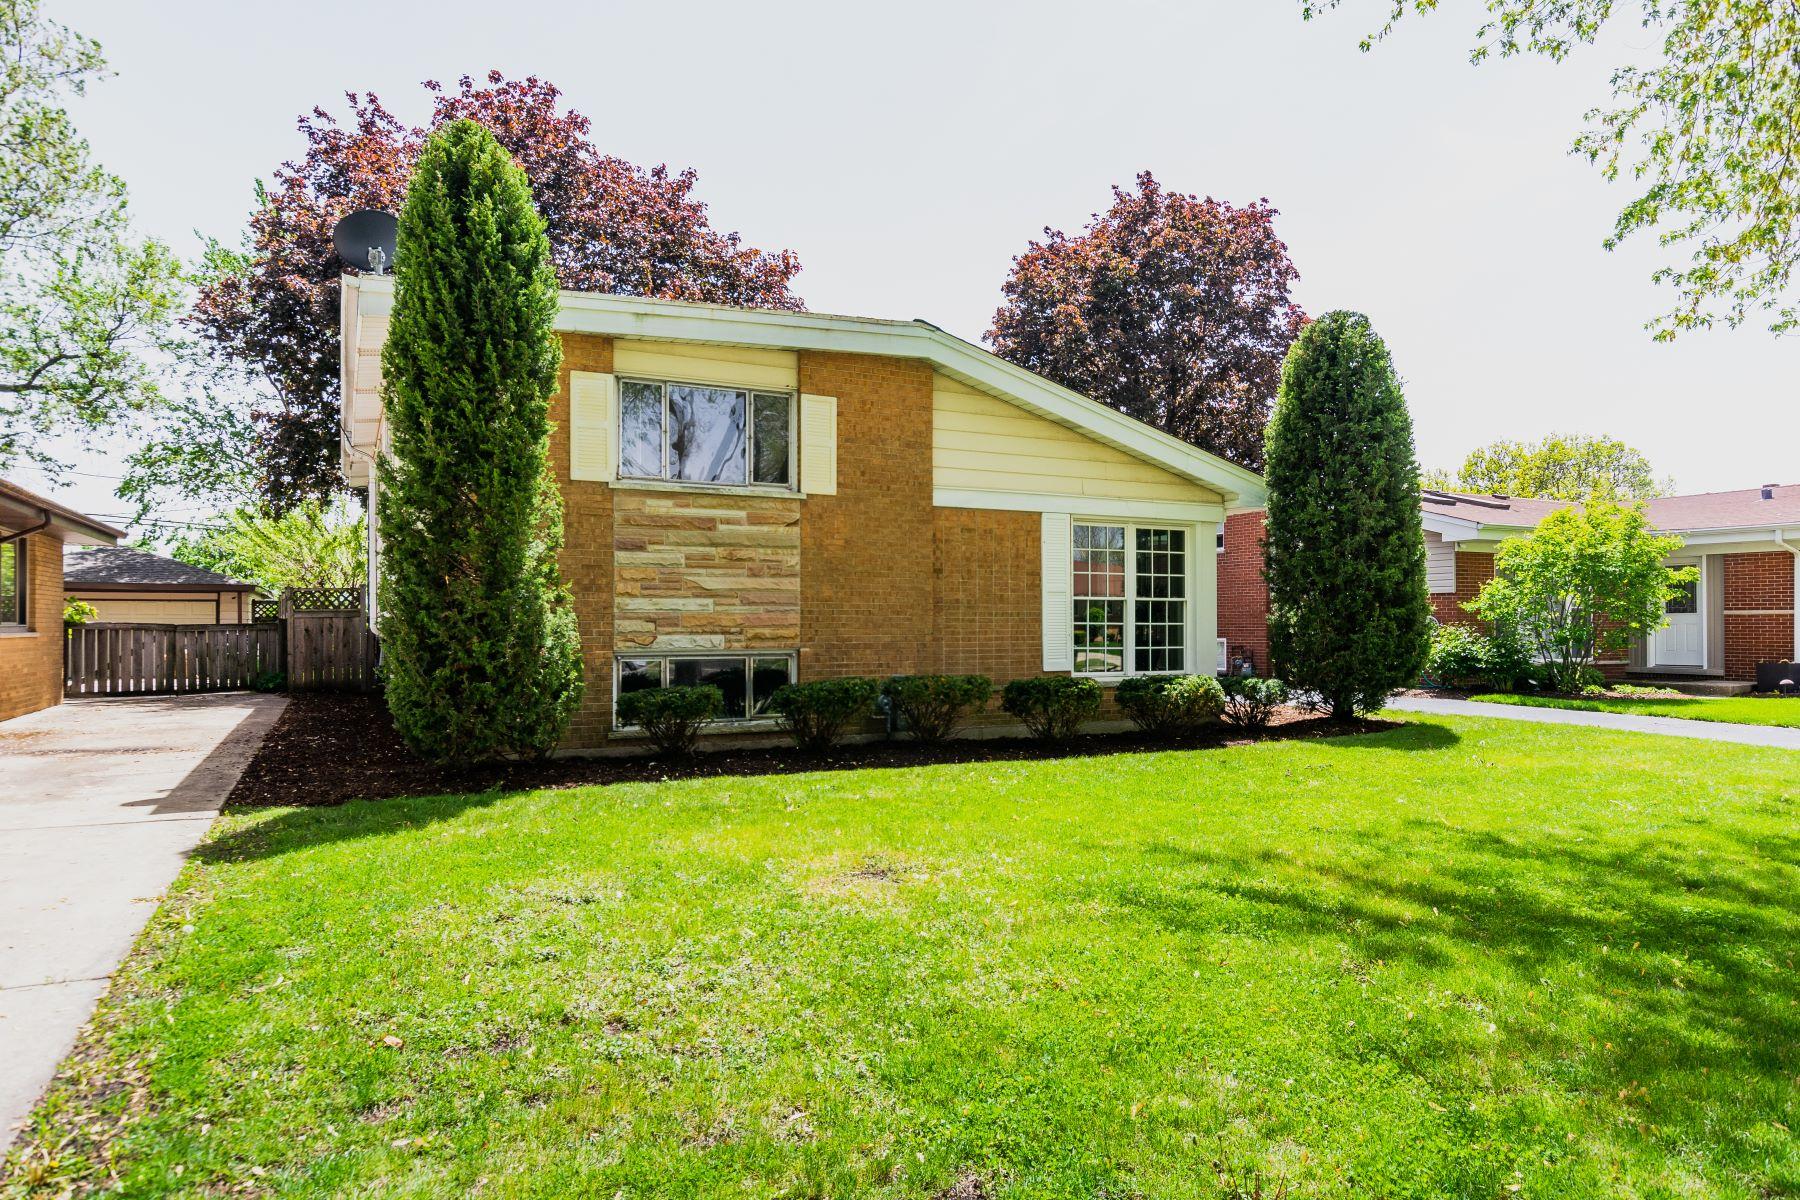 Single Family Homes для того Продажа на South Westchester Split-Level Home 11019 Martindale Drive Westchester, Иллинойс 60154 Соединенные Штаты